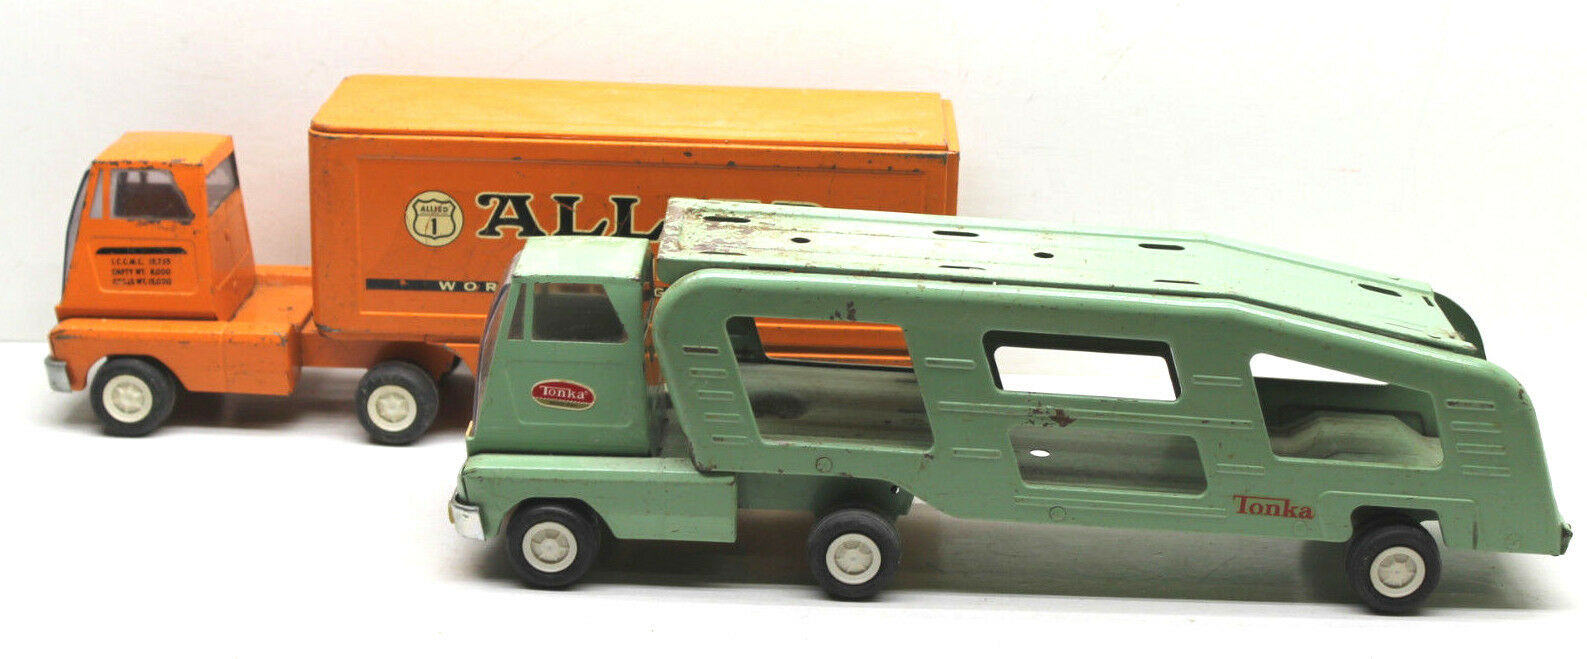 2 PC 1960s Vintage Tonka Chapa de acero Allied Allied Allied Van Lines + Minn EE. UU. coche vehículo 15  6f1bed